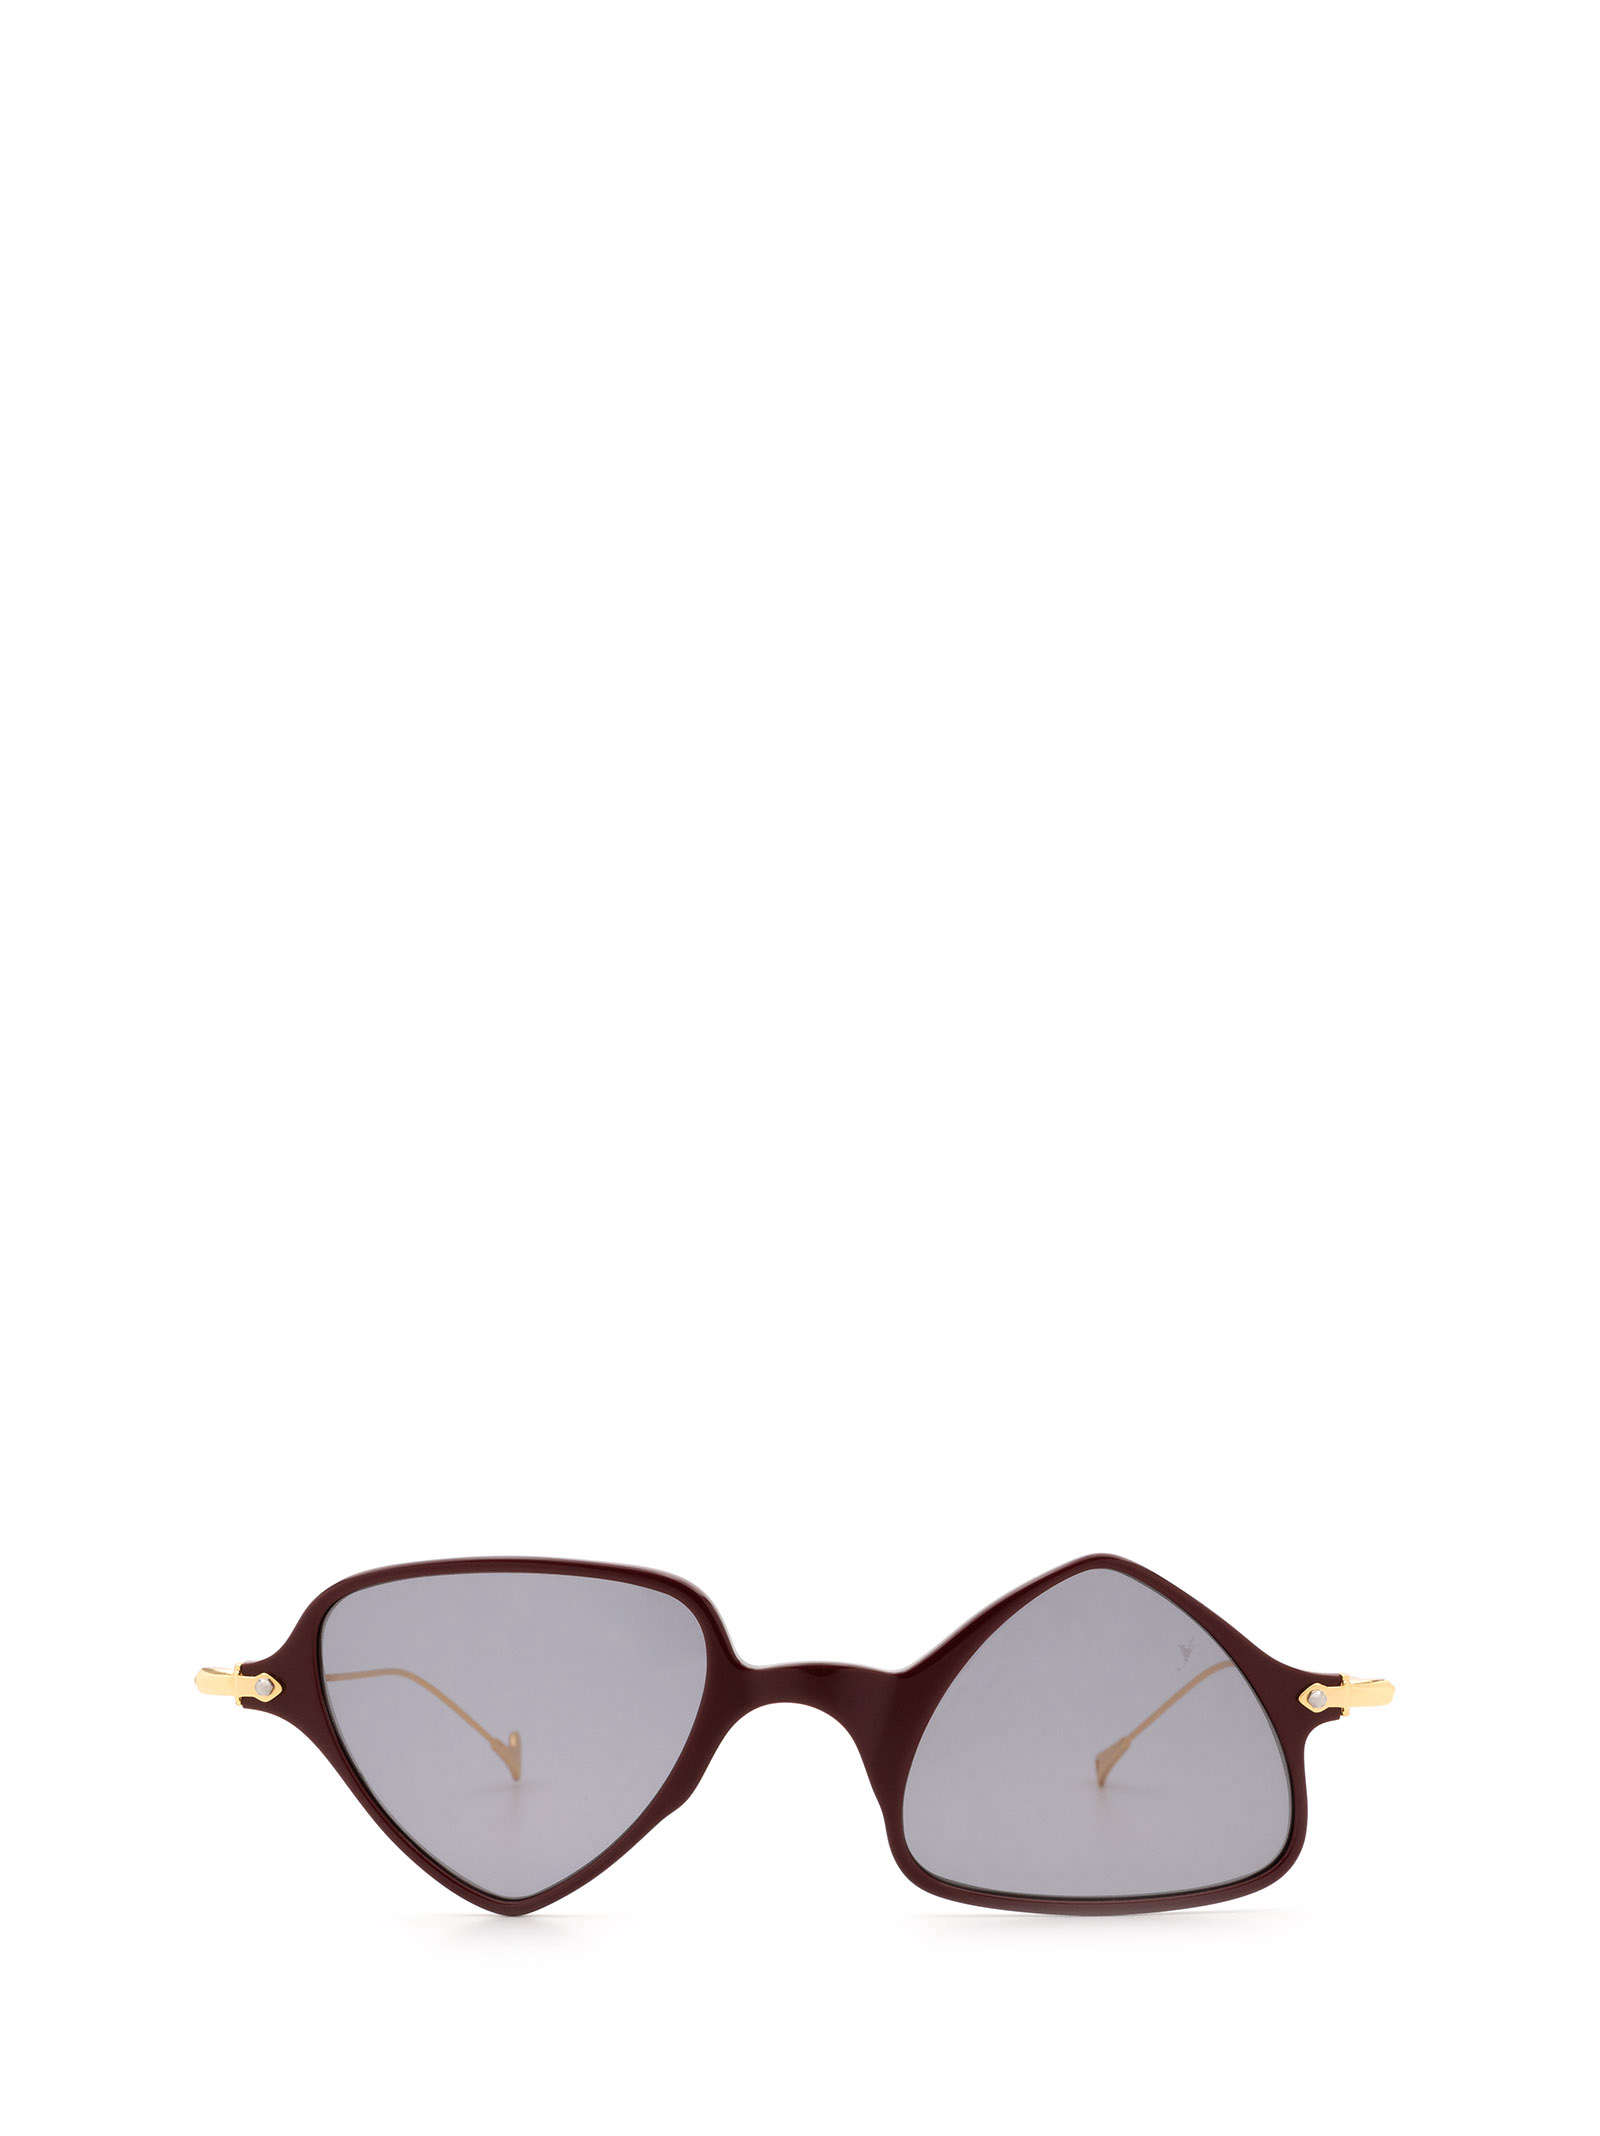 Eyepetizer Eyepetizer Twiggy Bordeaux Sunglasses